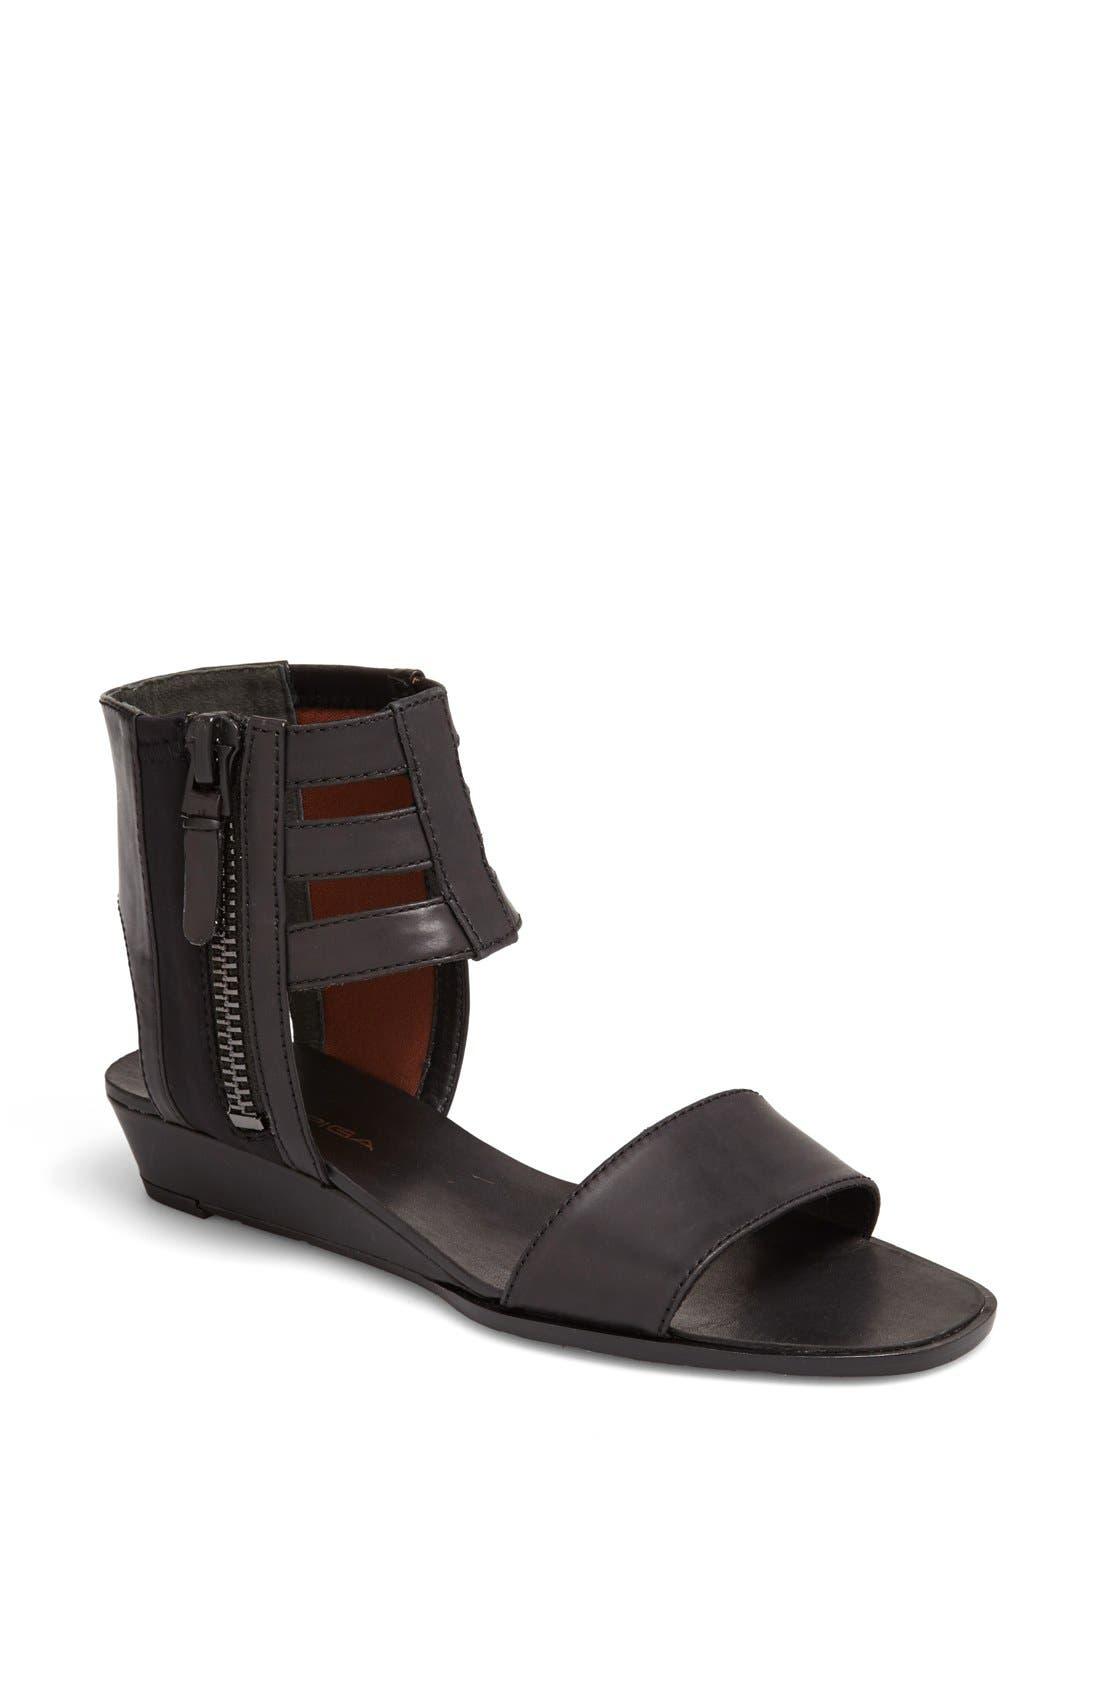 Main Image - Via Spiga 'Patrice' Leather Sandal